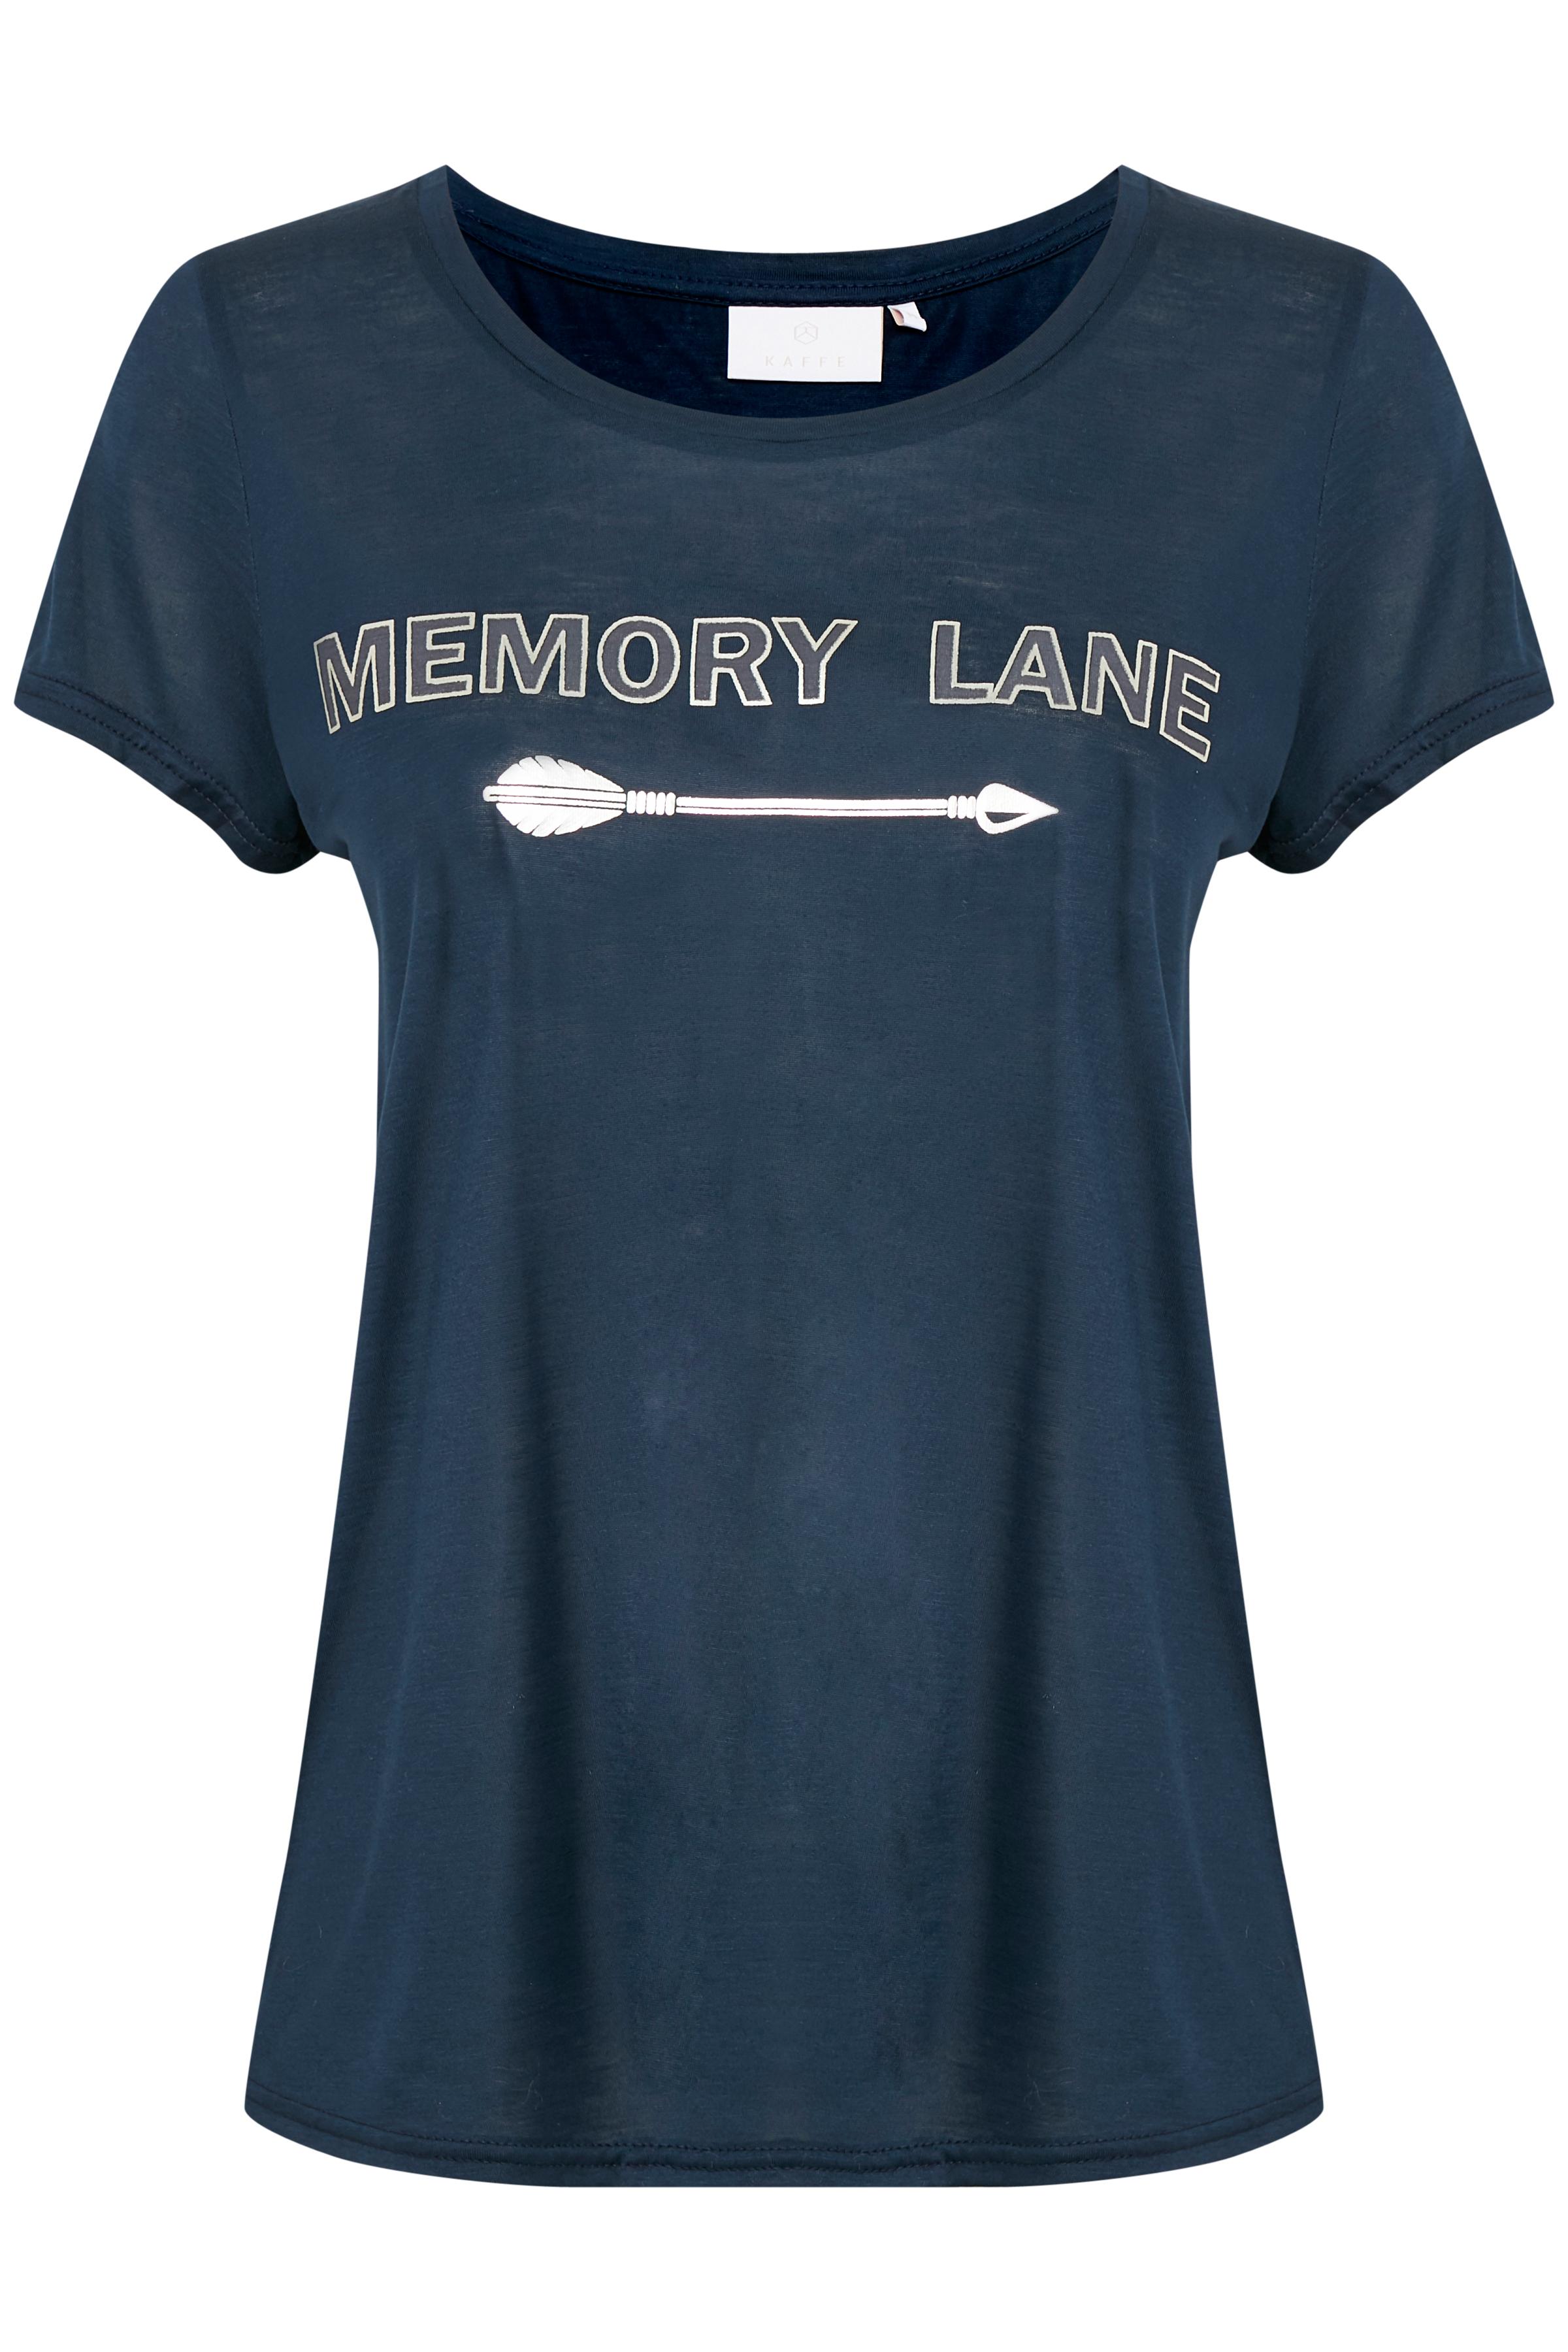 Marineblau Kurzarm T-Shirt von Kaffe – Shoppen Sie Marineblau Kurzarm T-Shirt ab Gr. L-XXL hier